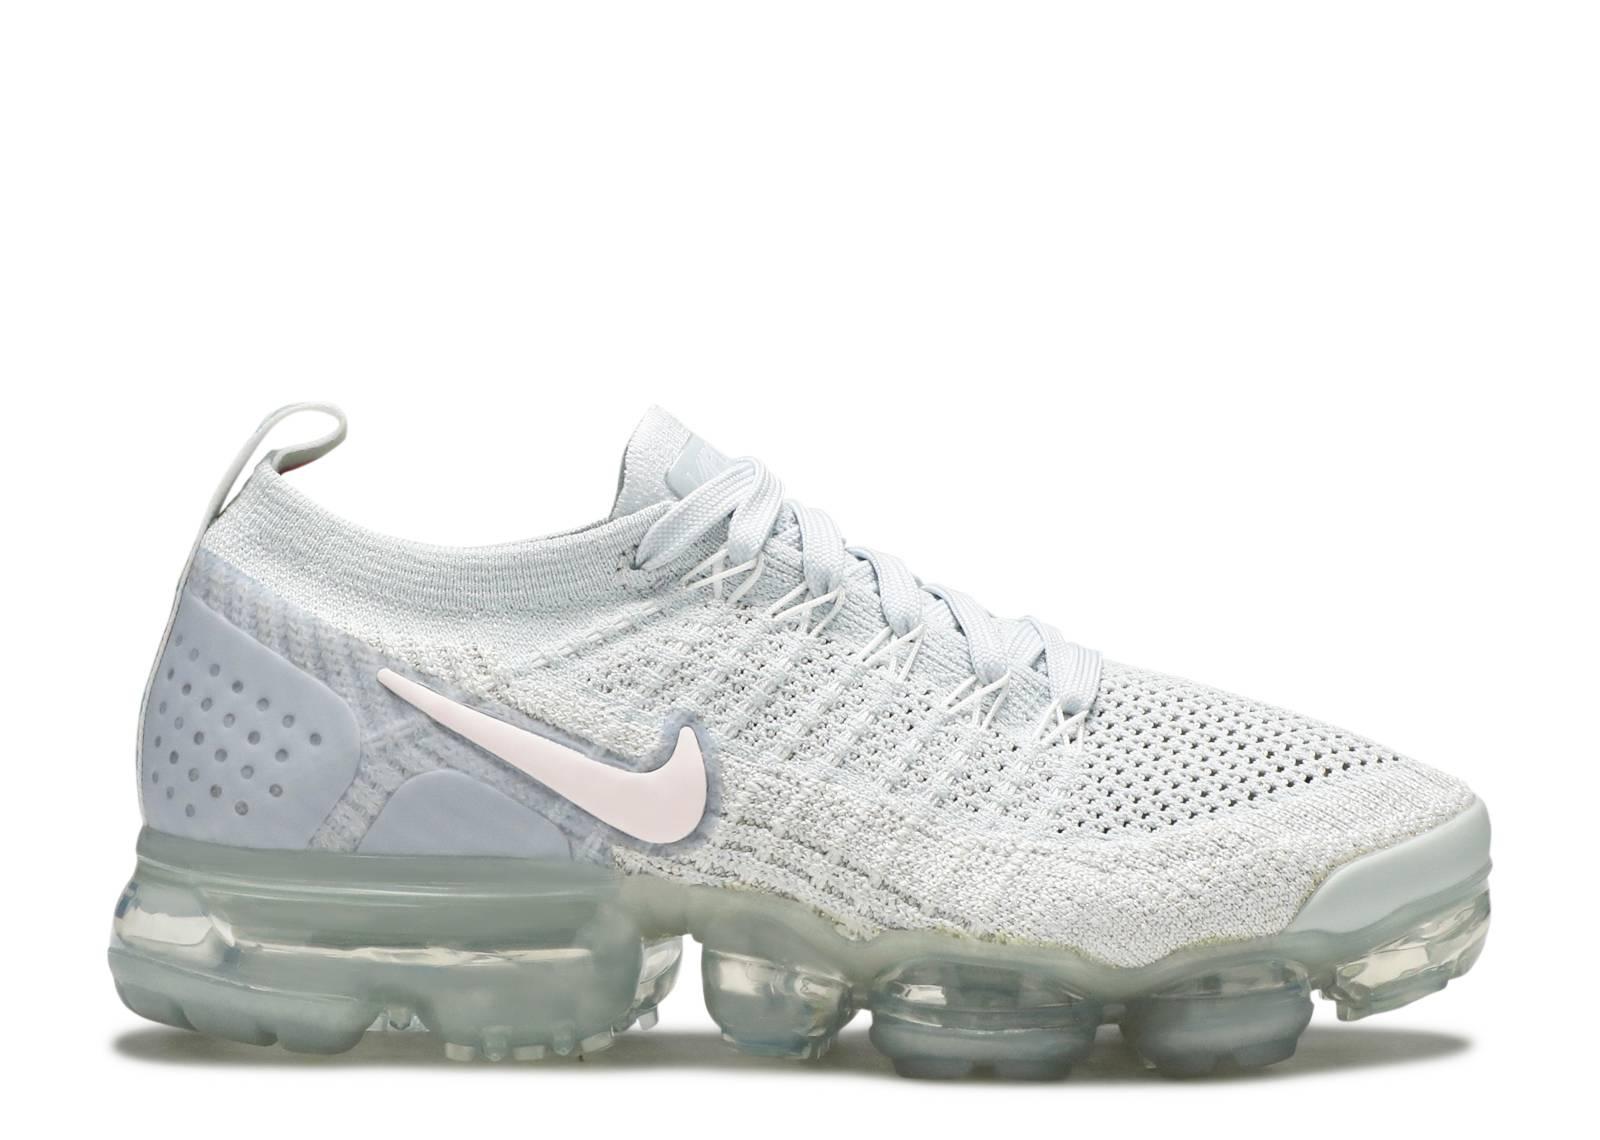 efda1fcb154fd W Nike Air Vapormax Flyknit 2 - Nike - 942843 011 - pure platinum/arctic  pink | Flight Club